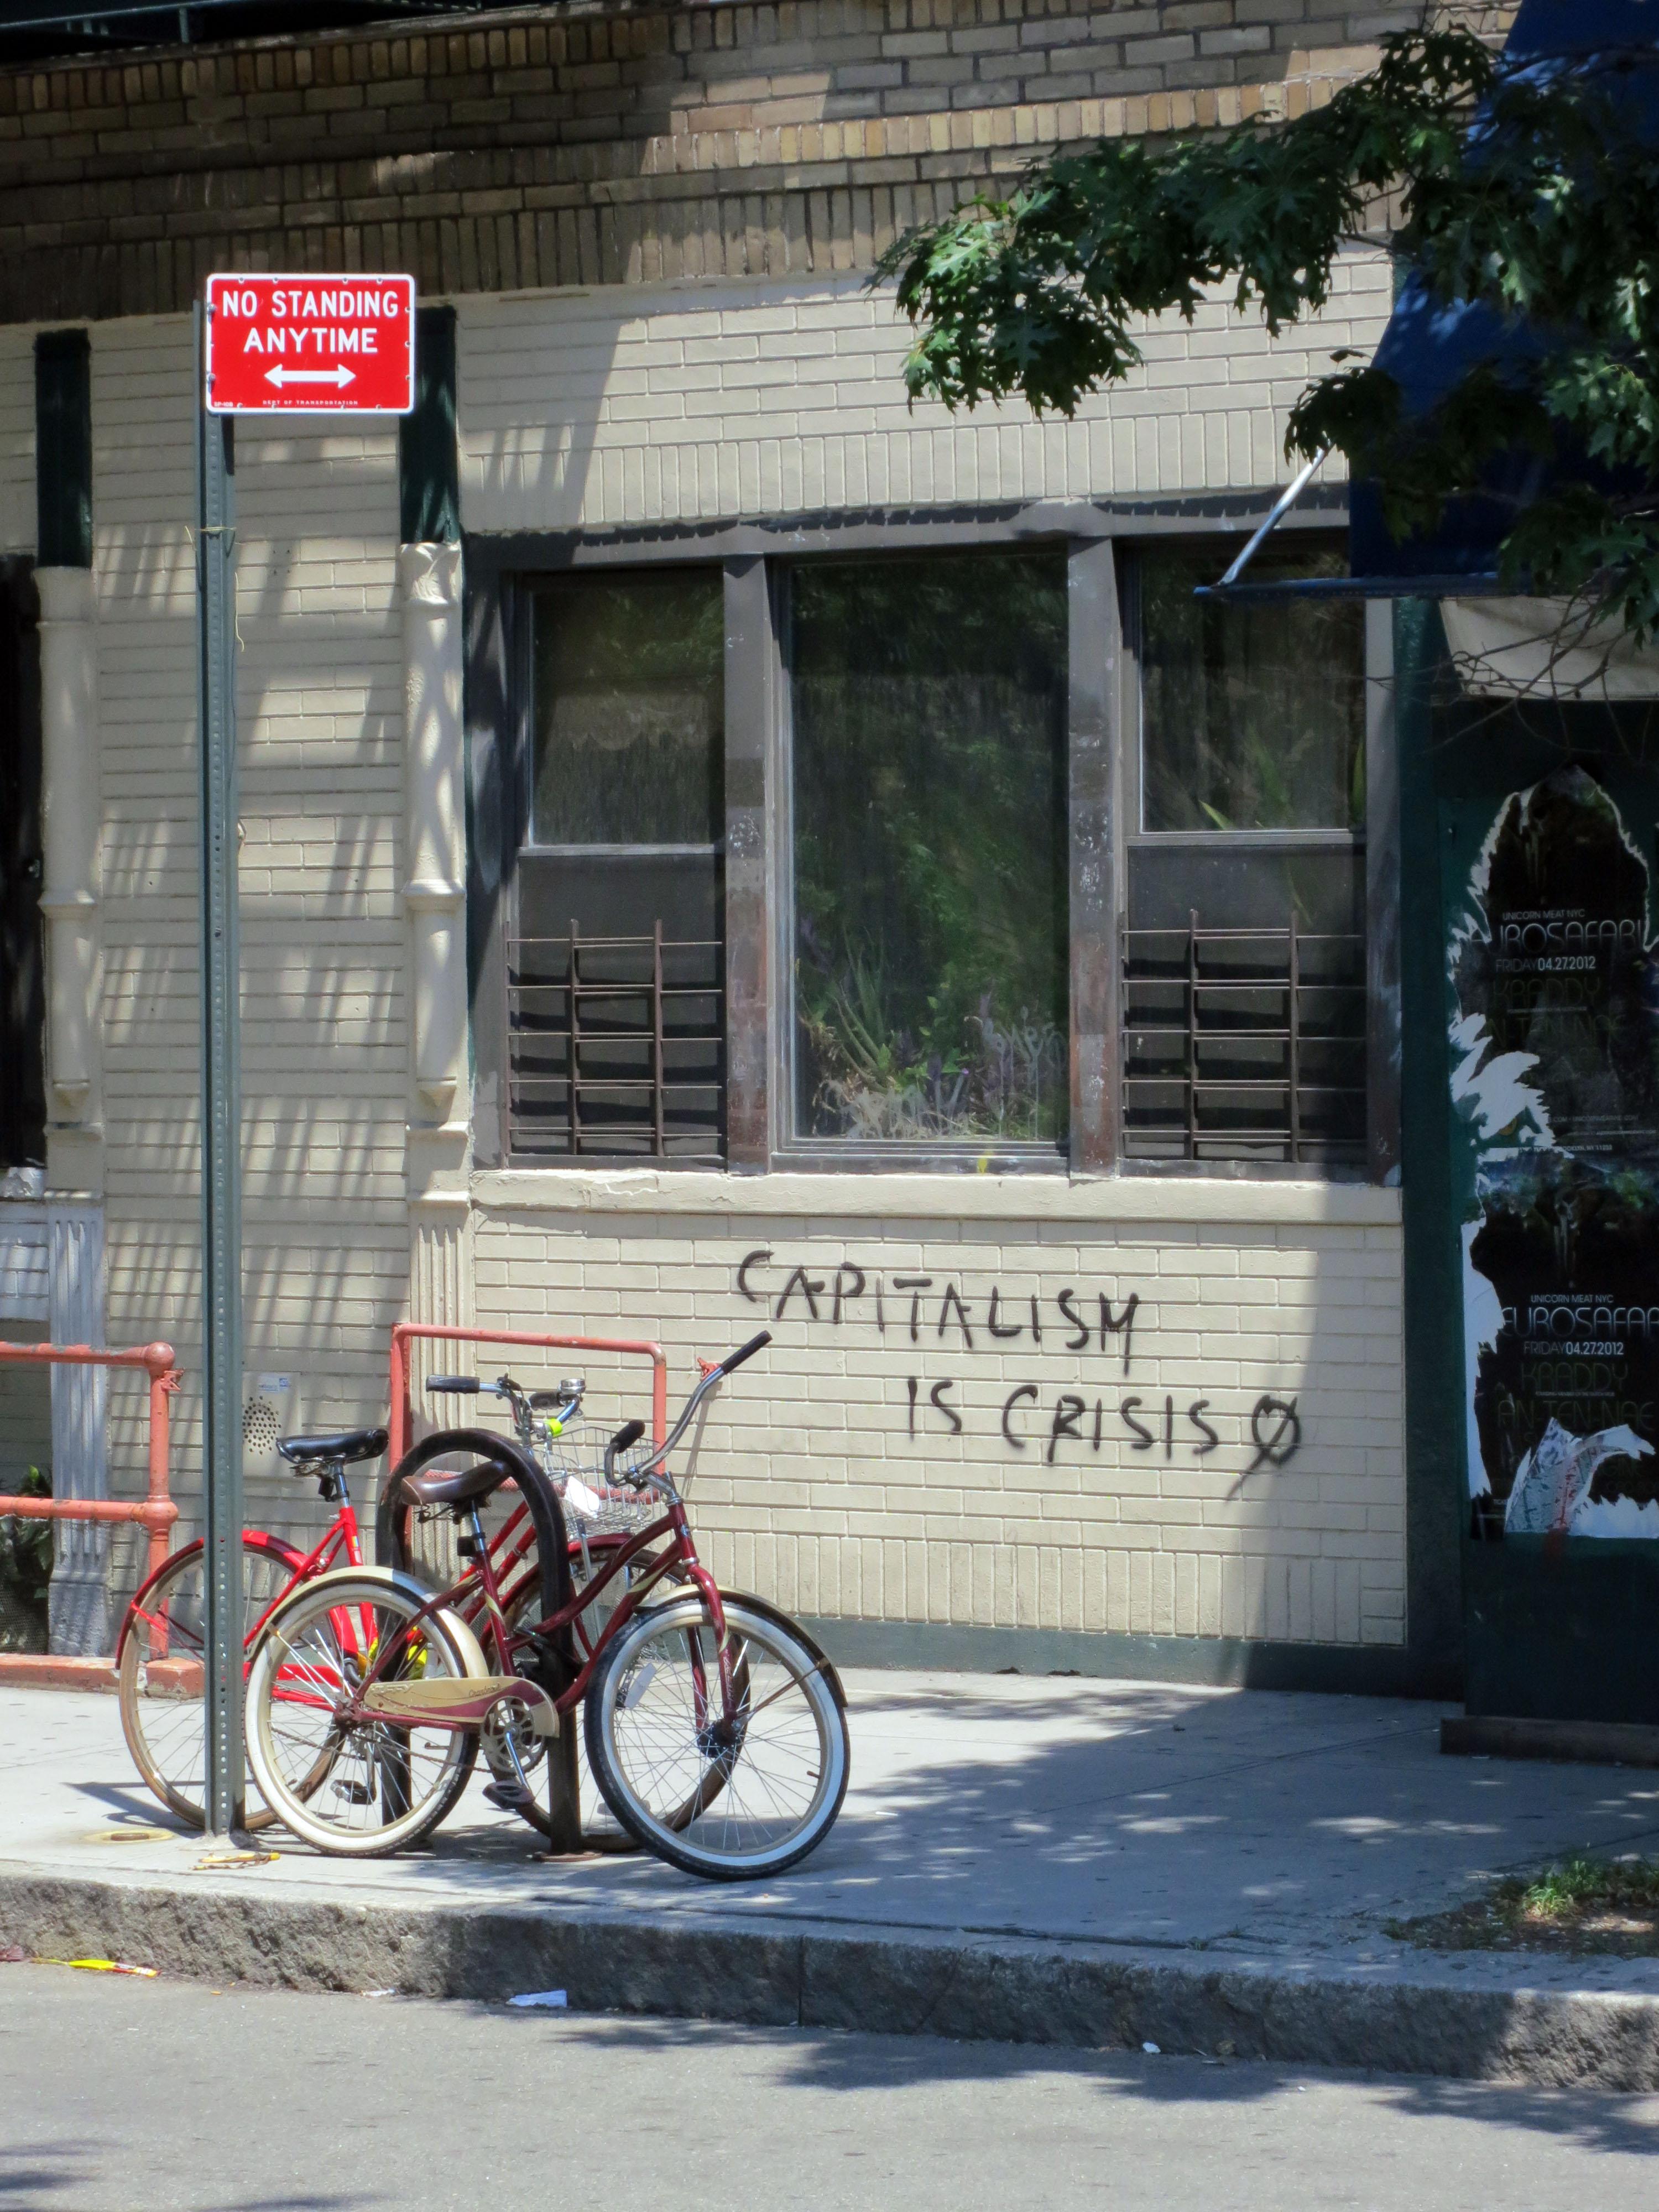 El capitalismo es crisis, Bike, Capitalism, Crisis, Graffiti, HQ Photo